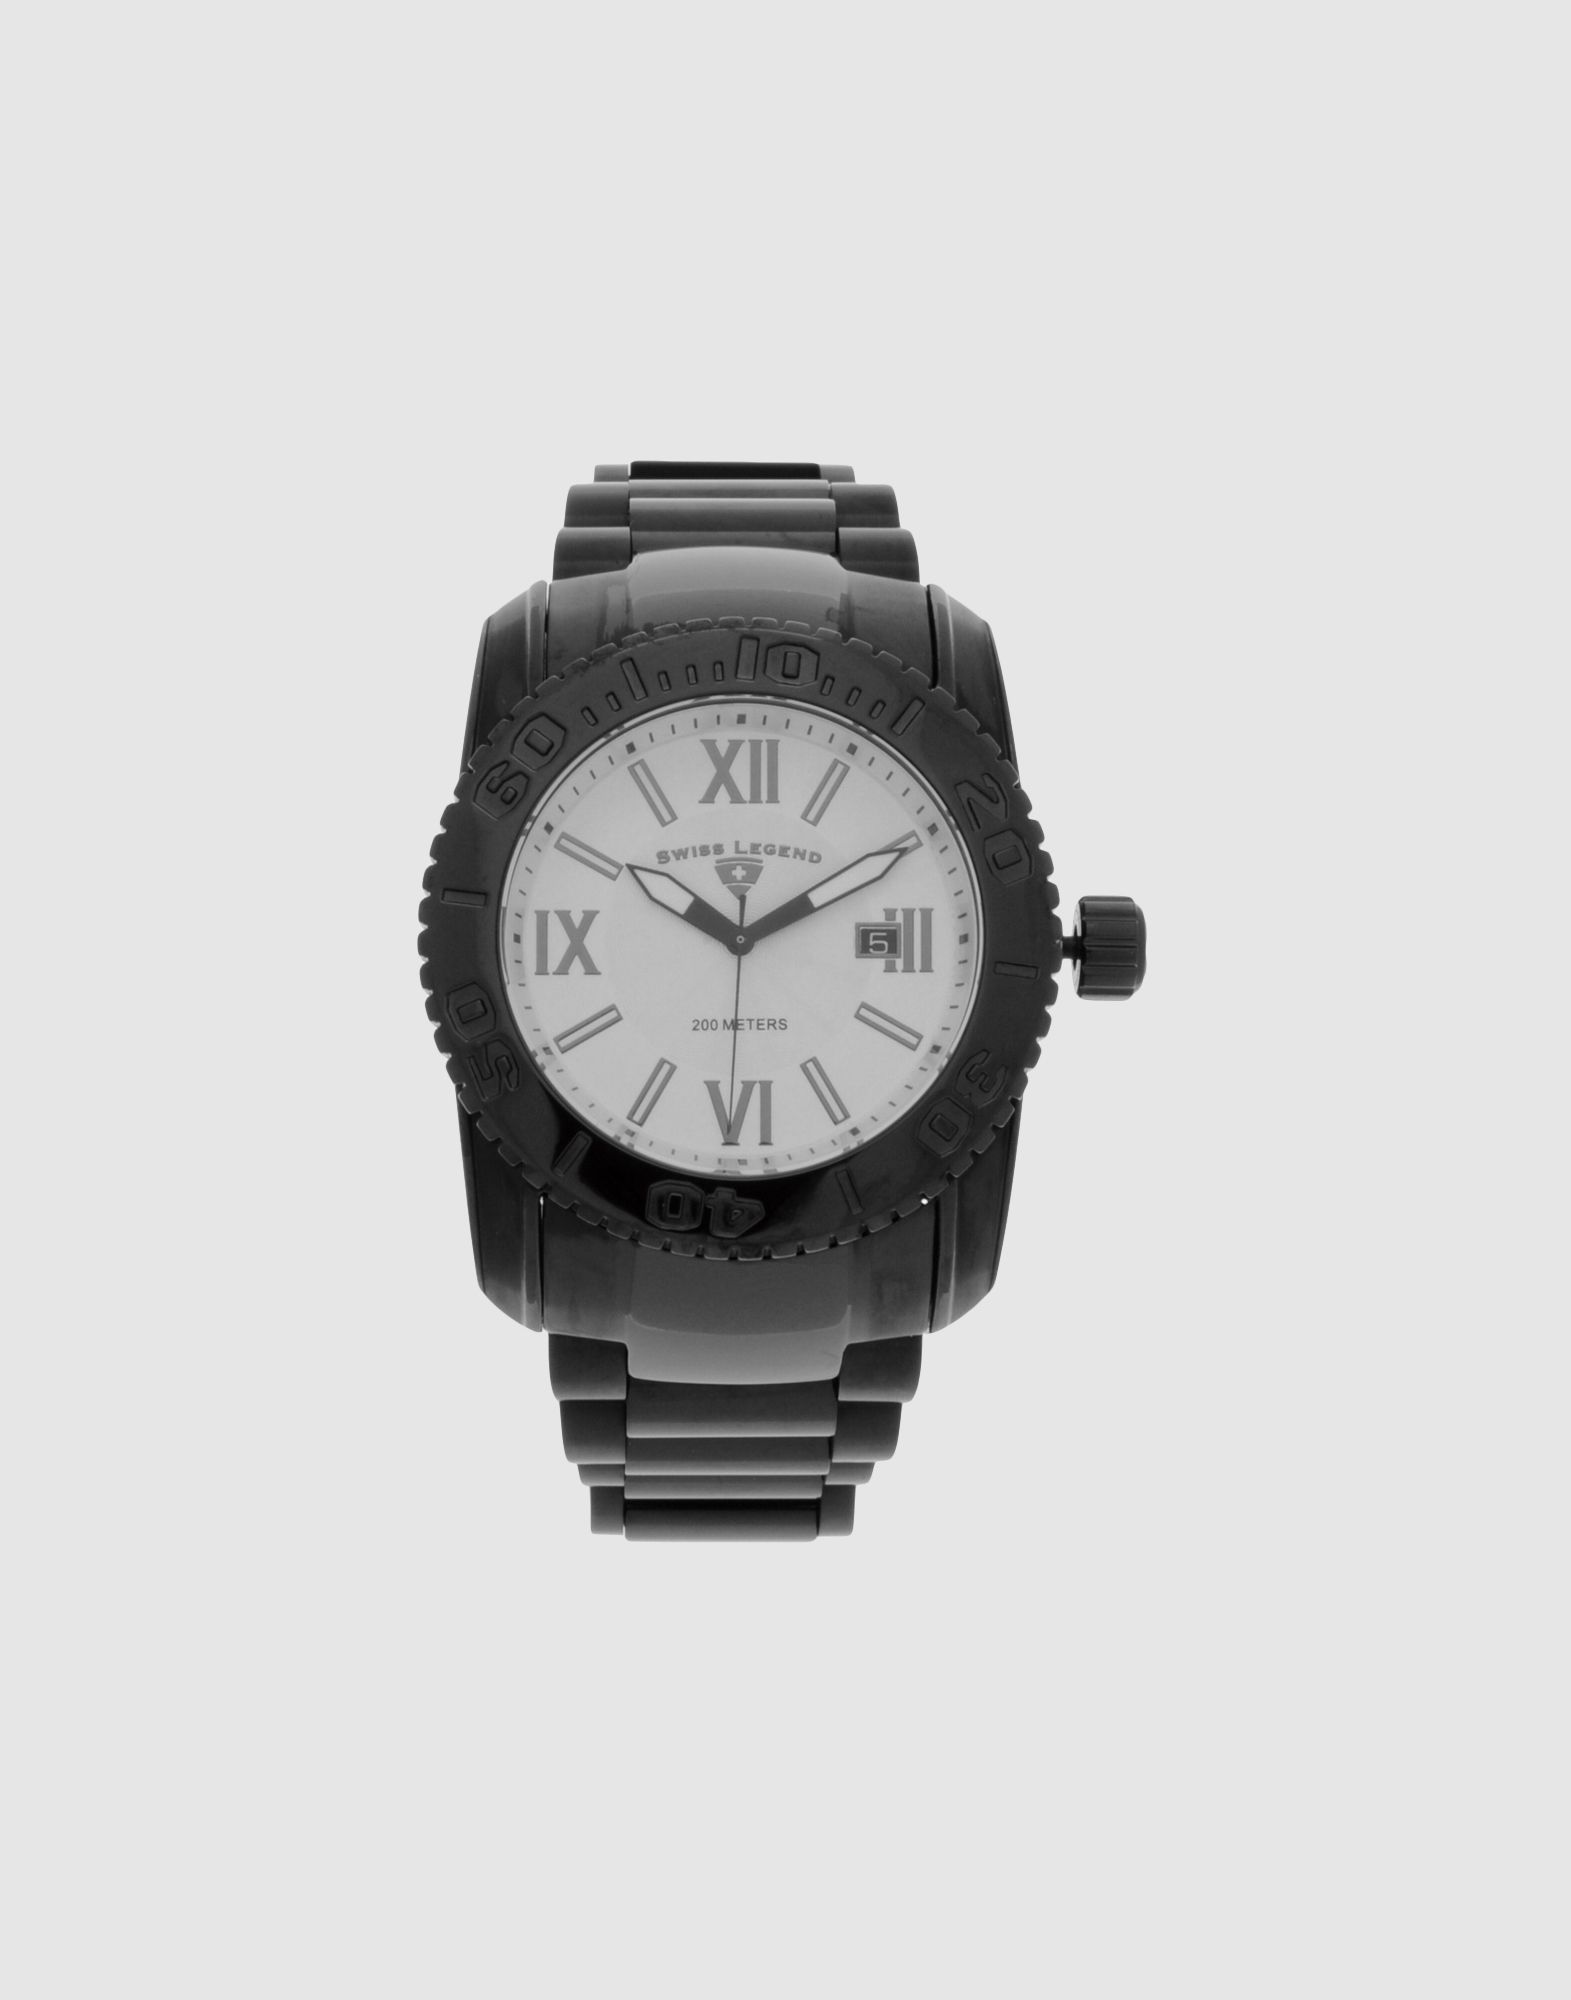 SWISS LEGEND Wrist watches